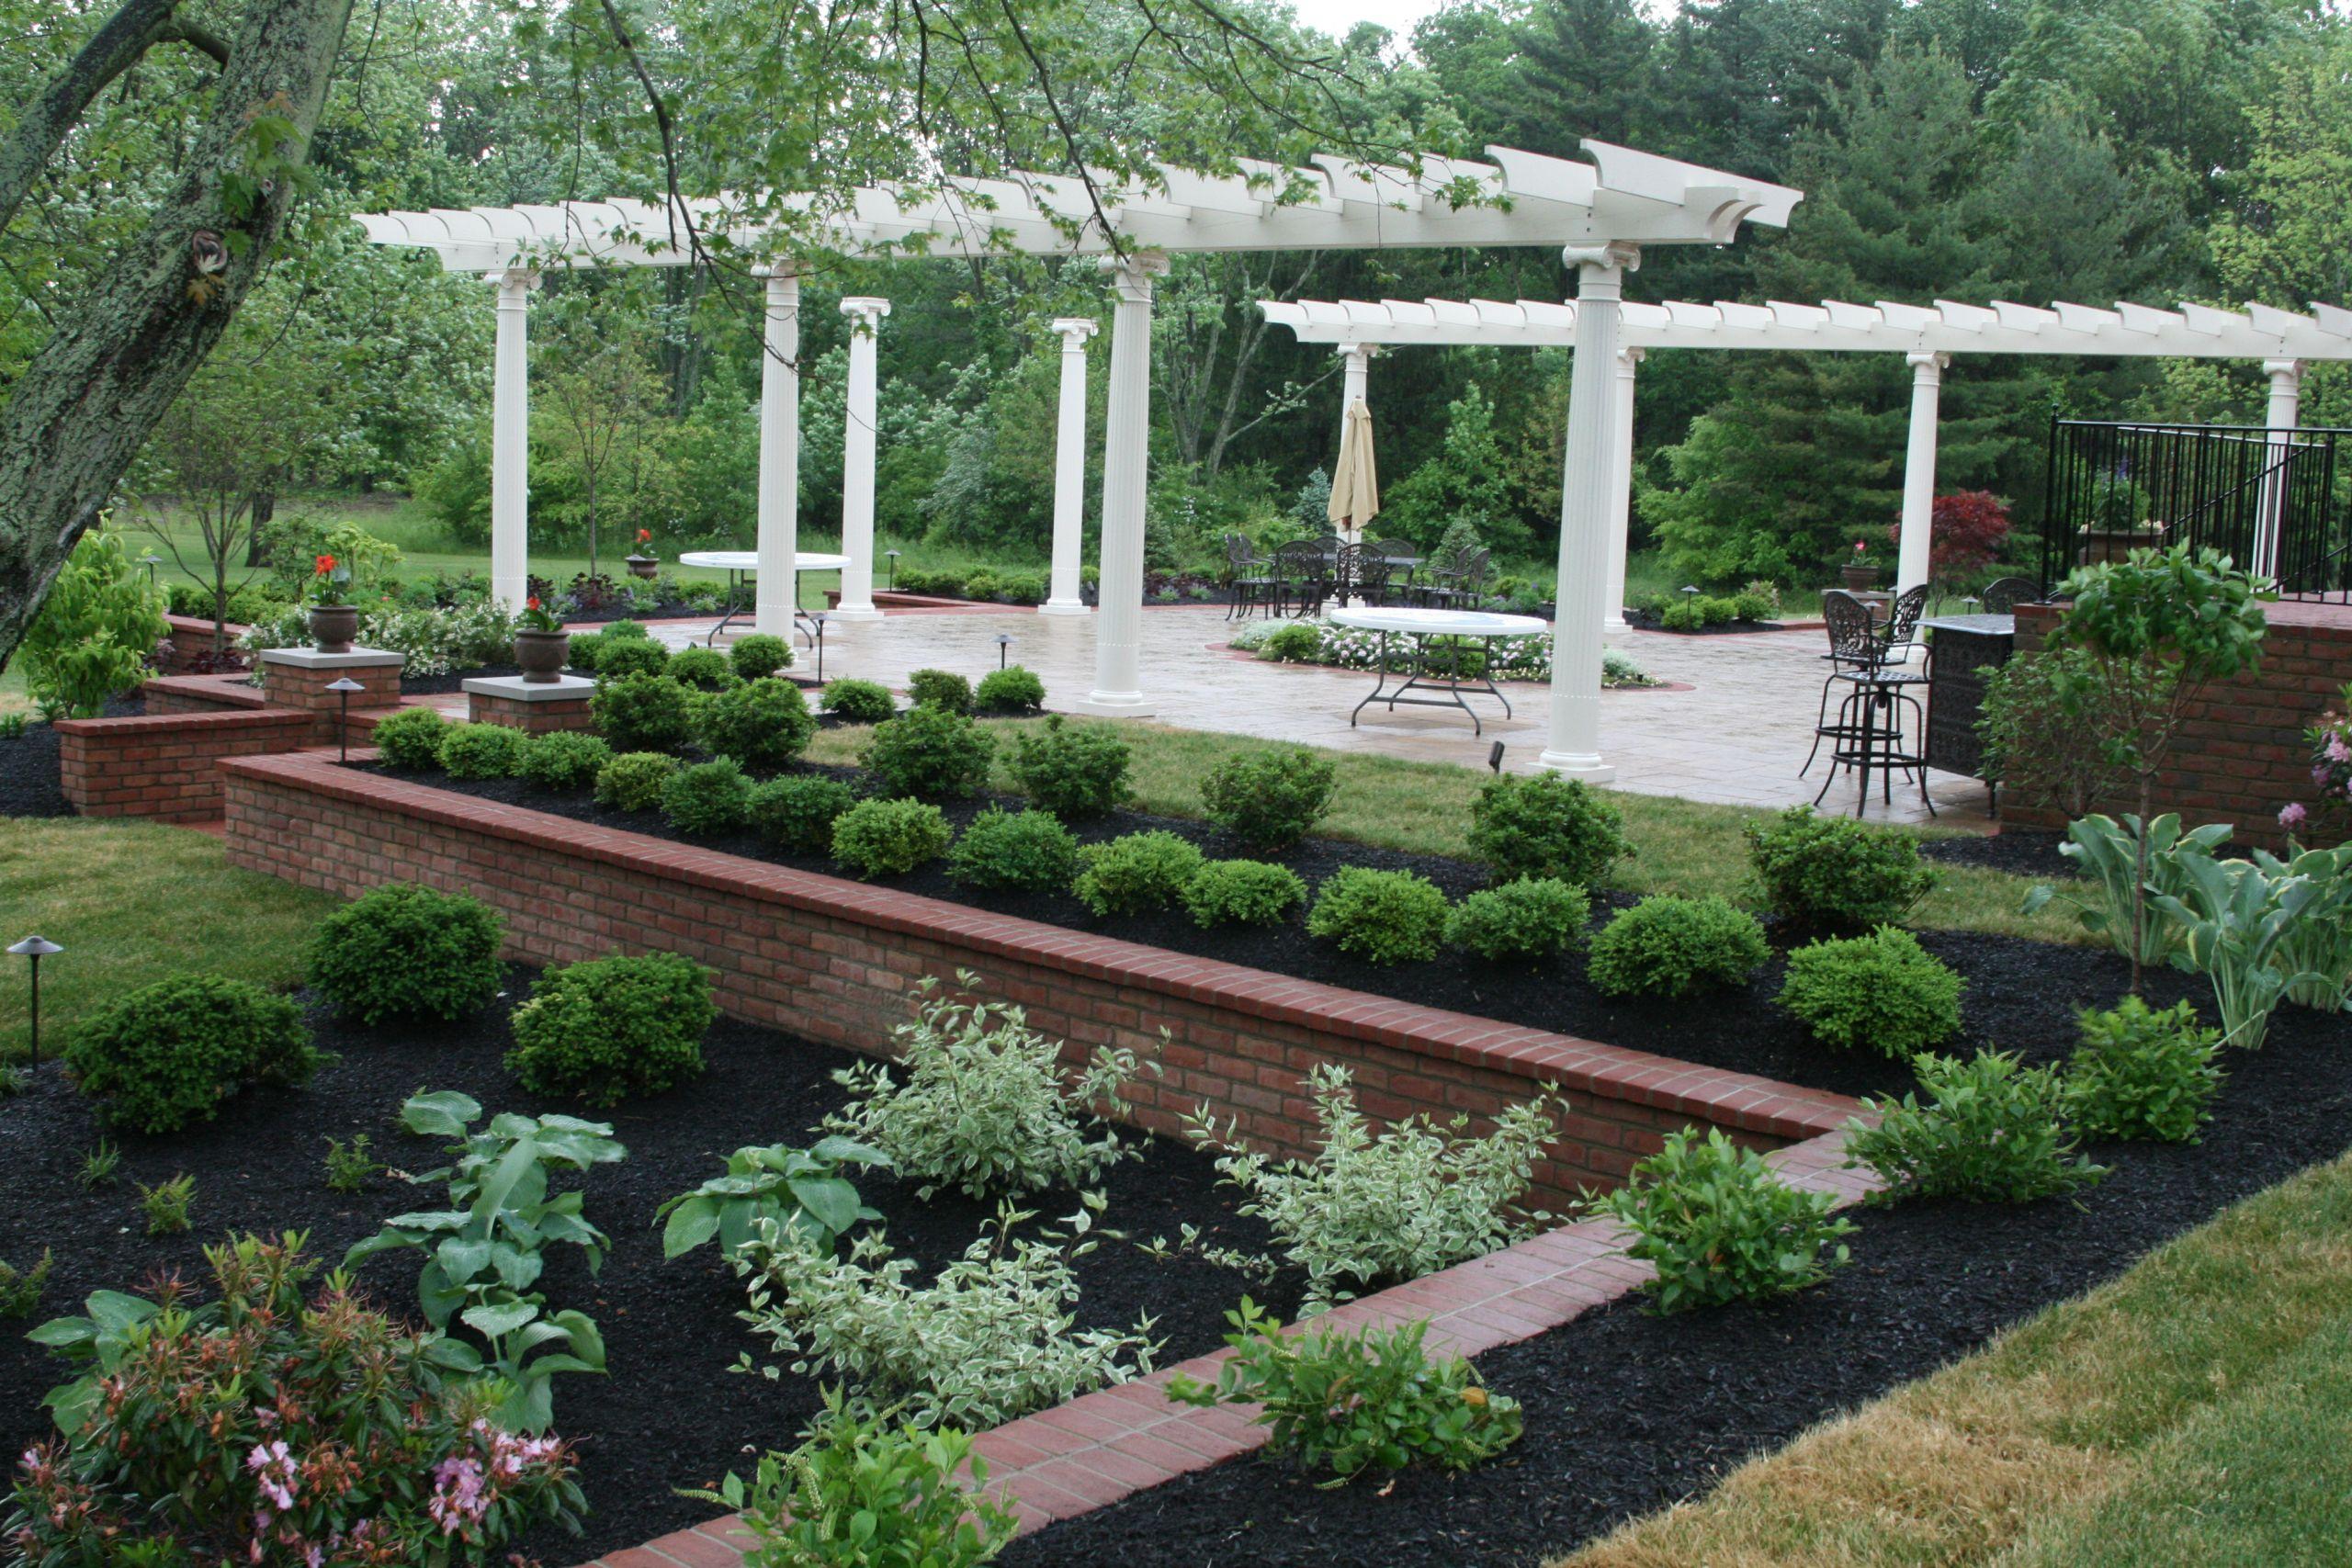 Association Of Professional Landscape Designers  THE OHIO CHAPTER OF THE ASSOCIATION OF PROFESSIONAL